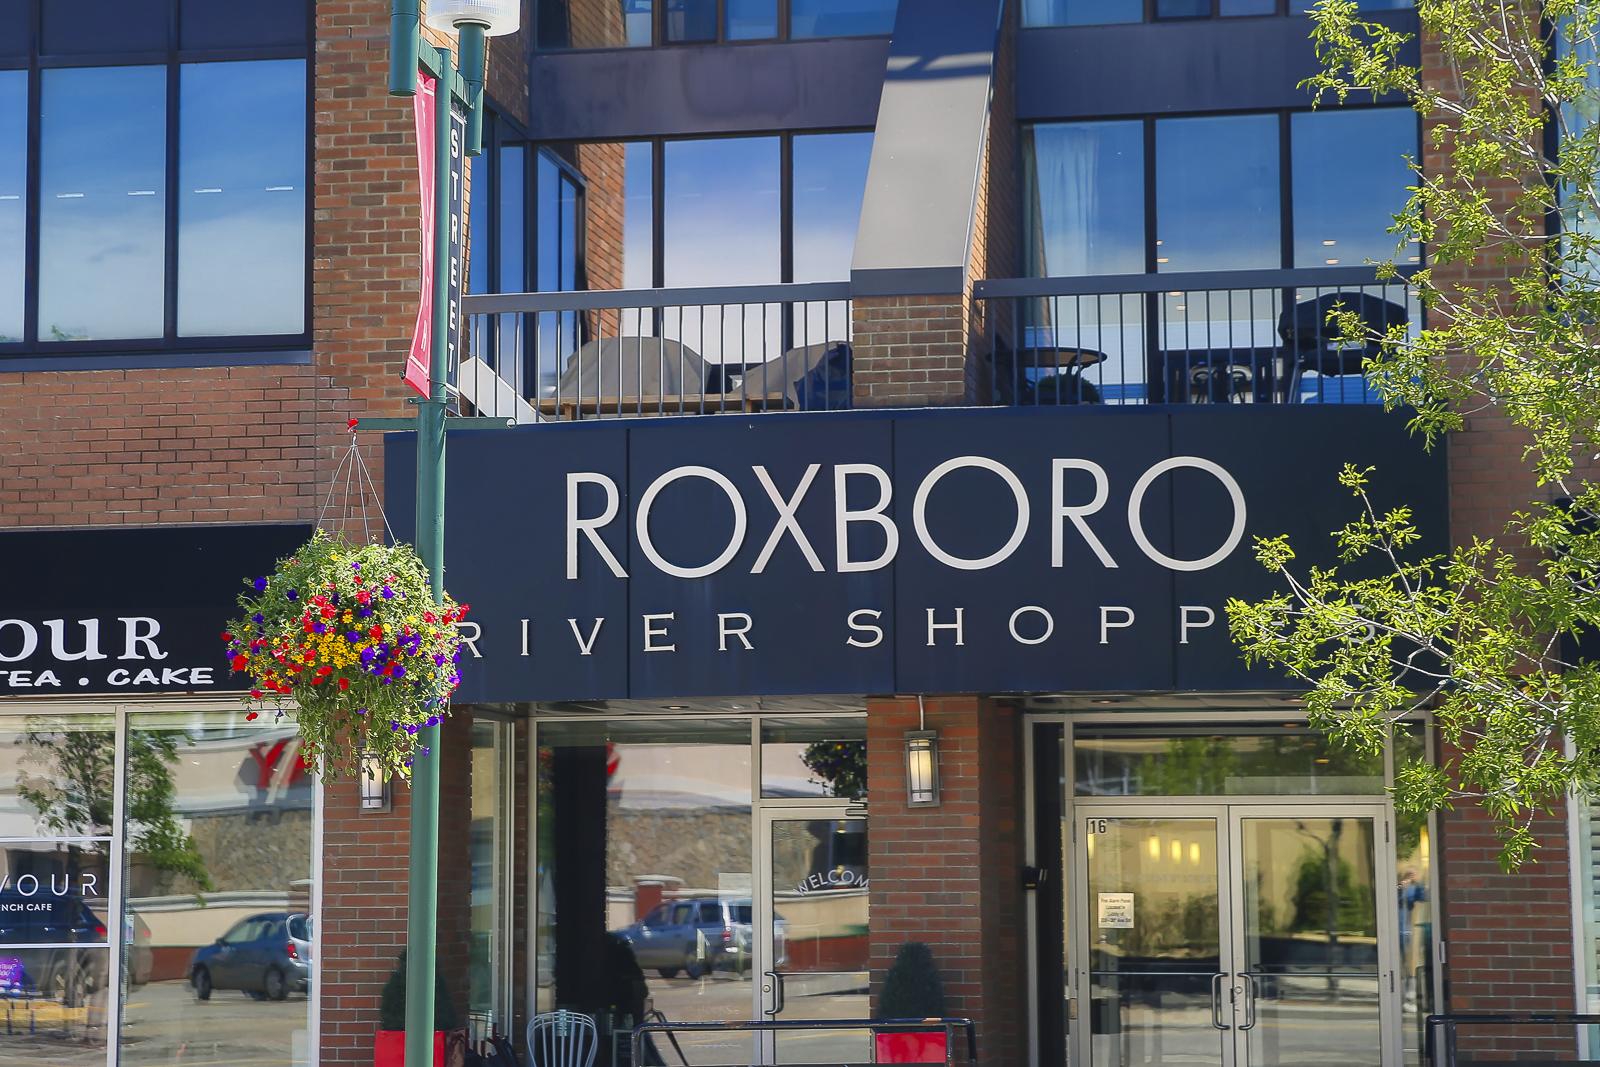 2017 Roxboro Web Content-17.JPG